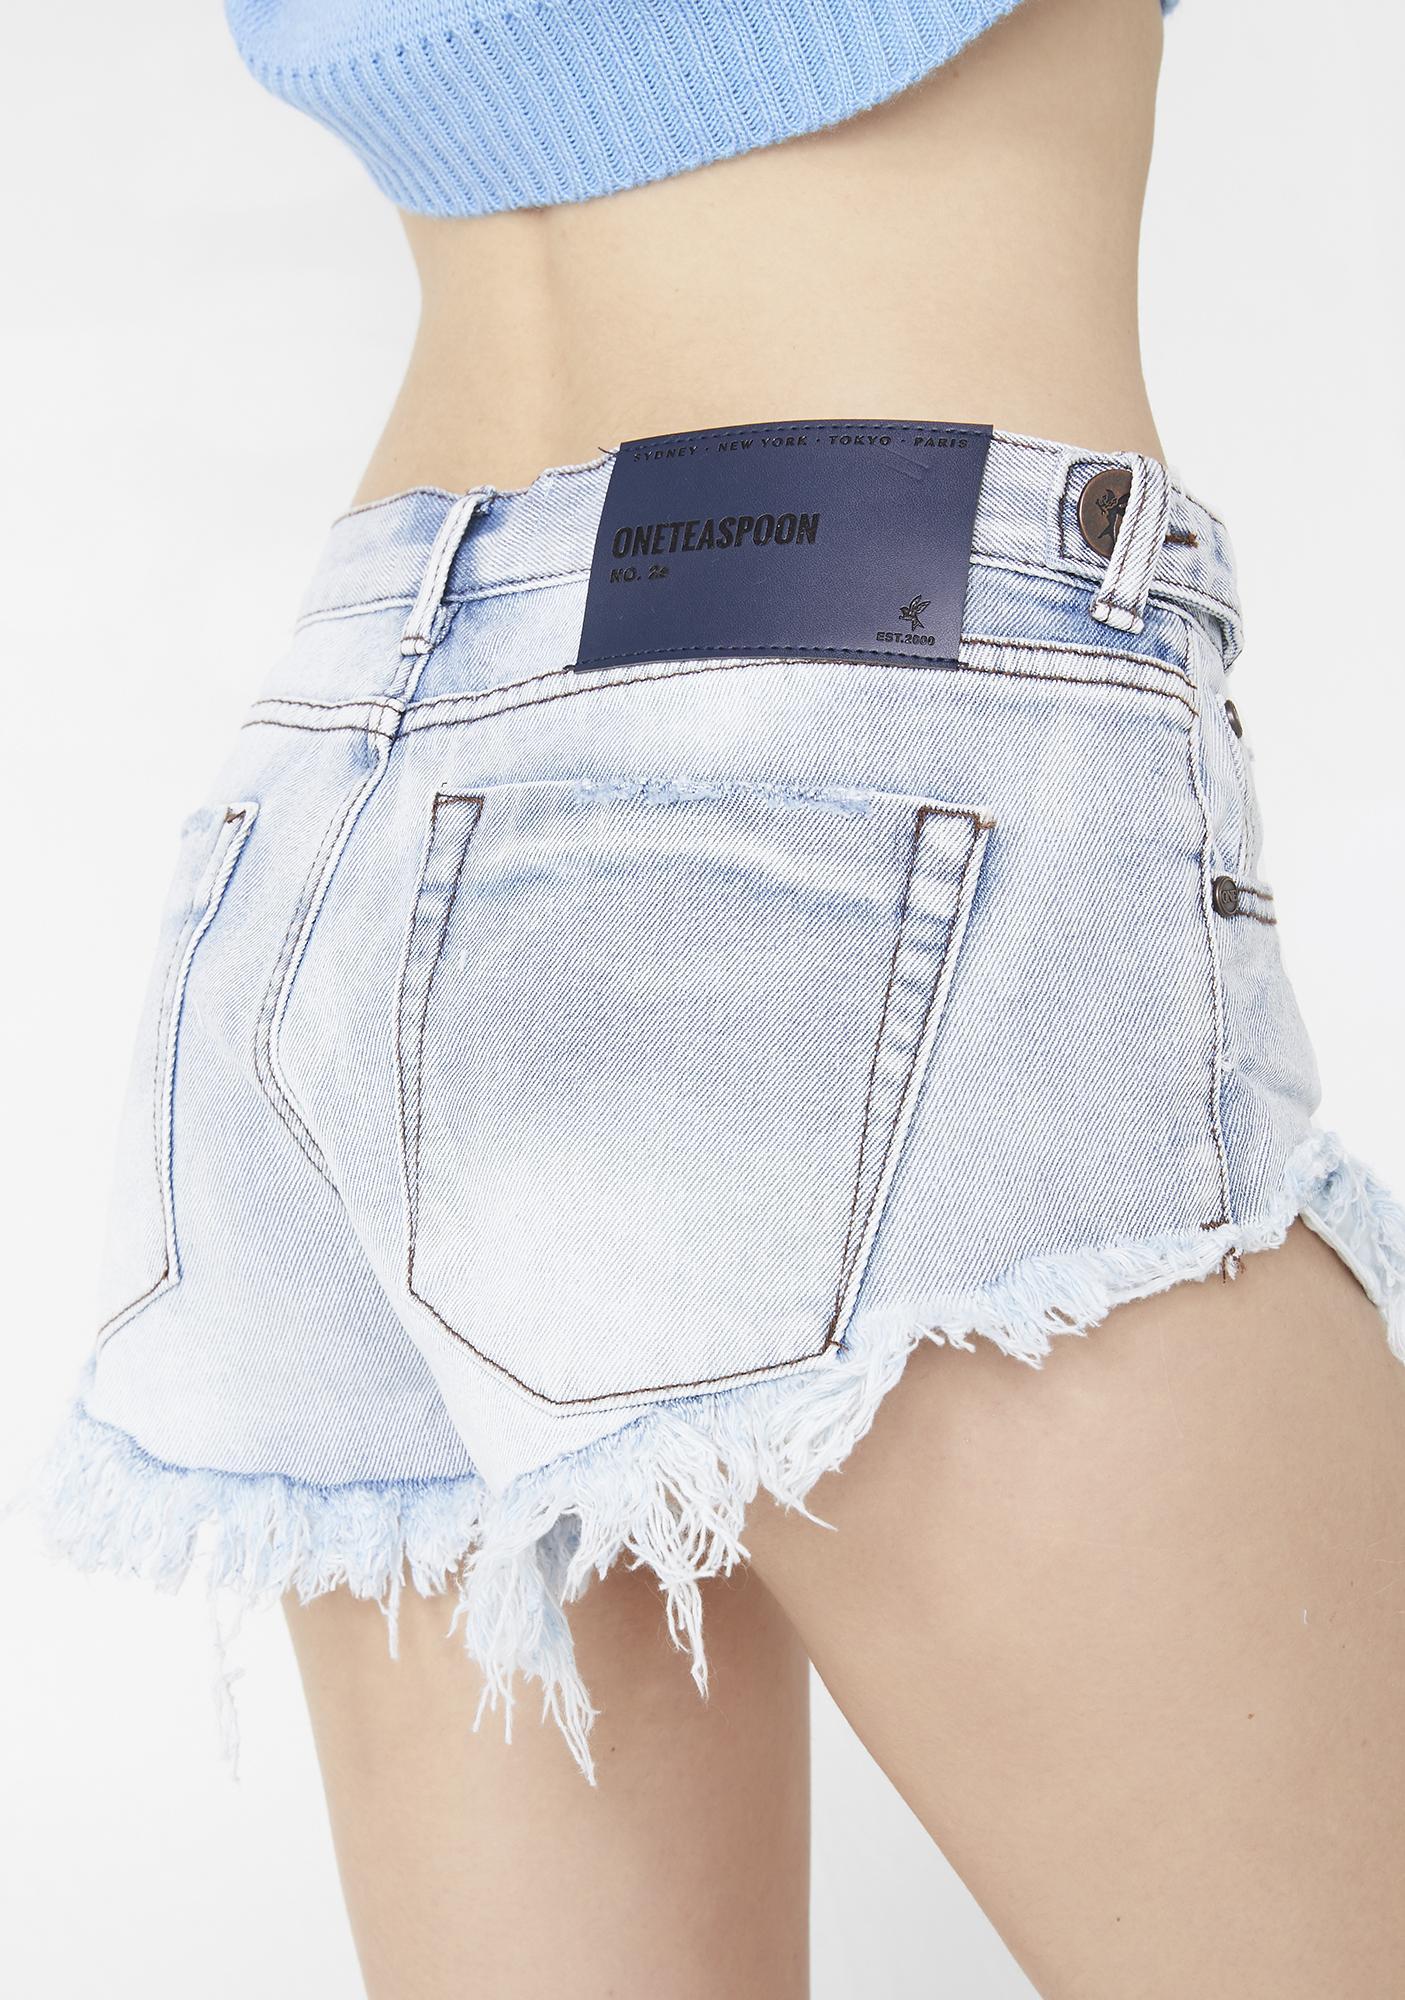 One Teaspoon Antique No. 25 Low Waist Mini Denim Shorts